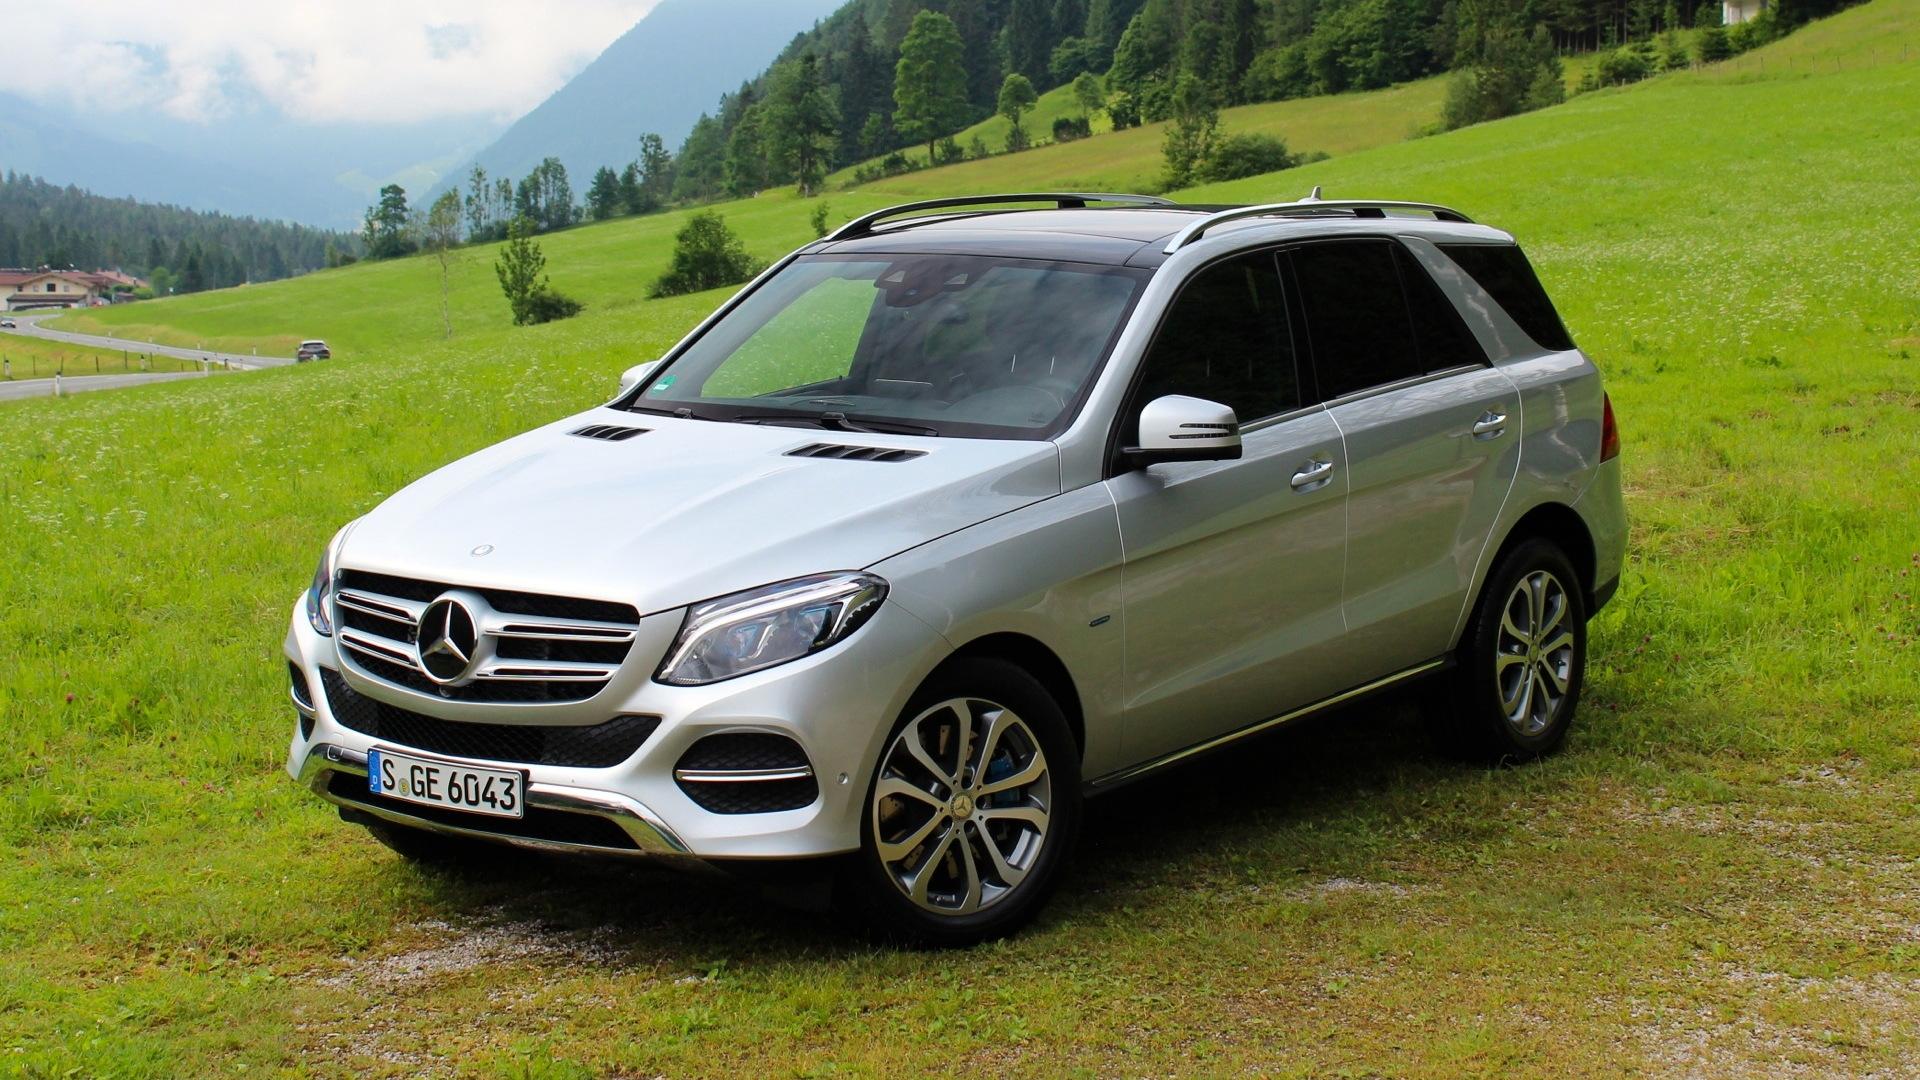 2016 Mercedes-Benz GLE550e Plug-In Hybrid